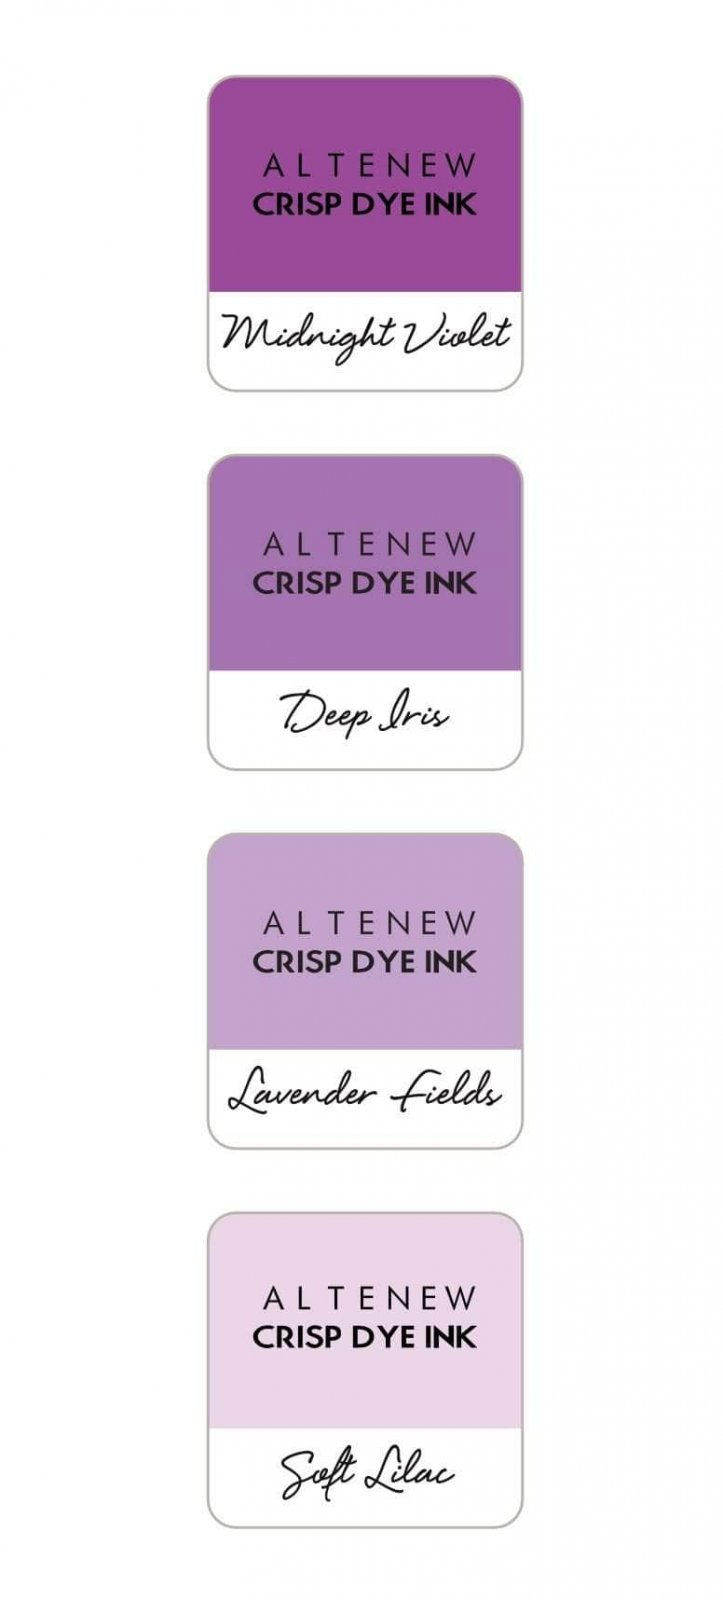 Altenew - Shades of Purple Crispy Dye Ink Mini Cube Set